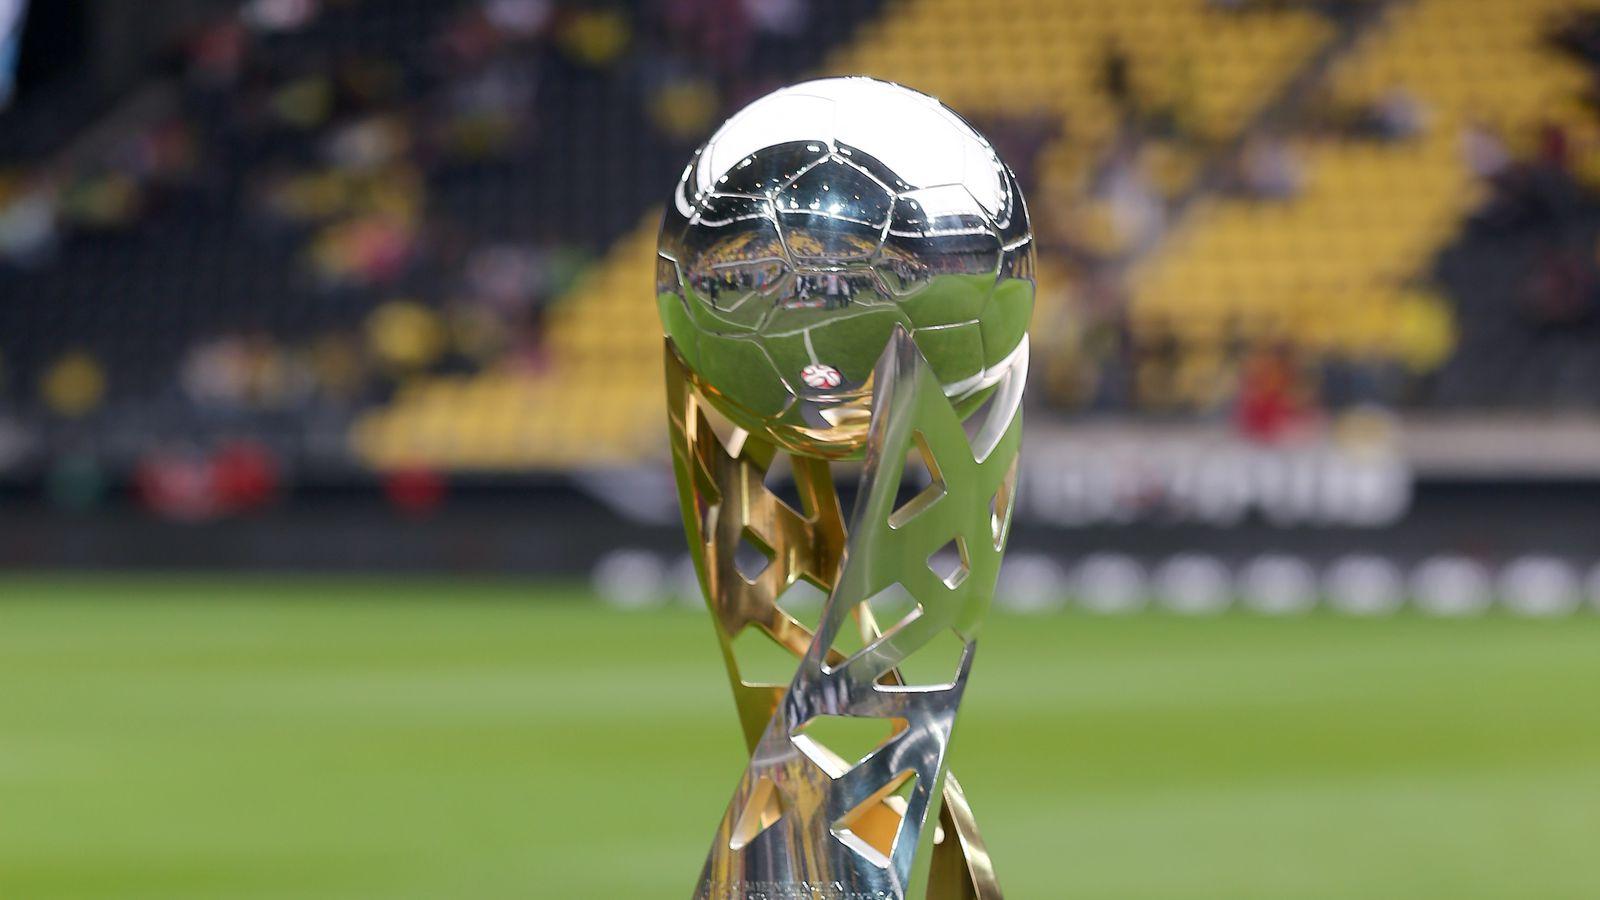 Wolfsburg vs Bayern Munich, 2015 DFL Supercup: Live stream ...